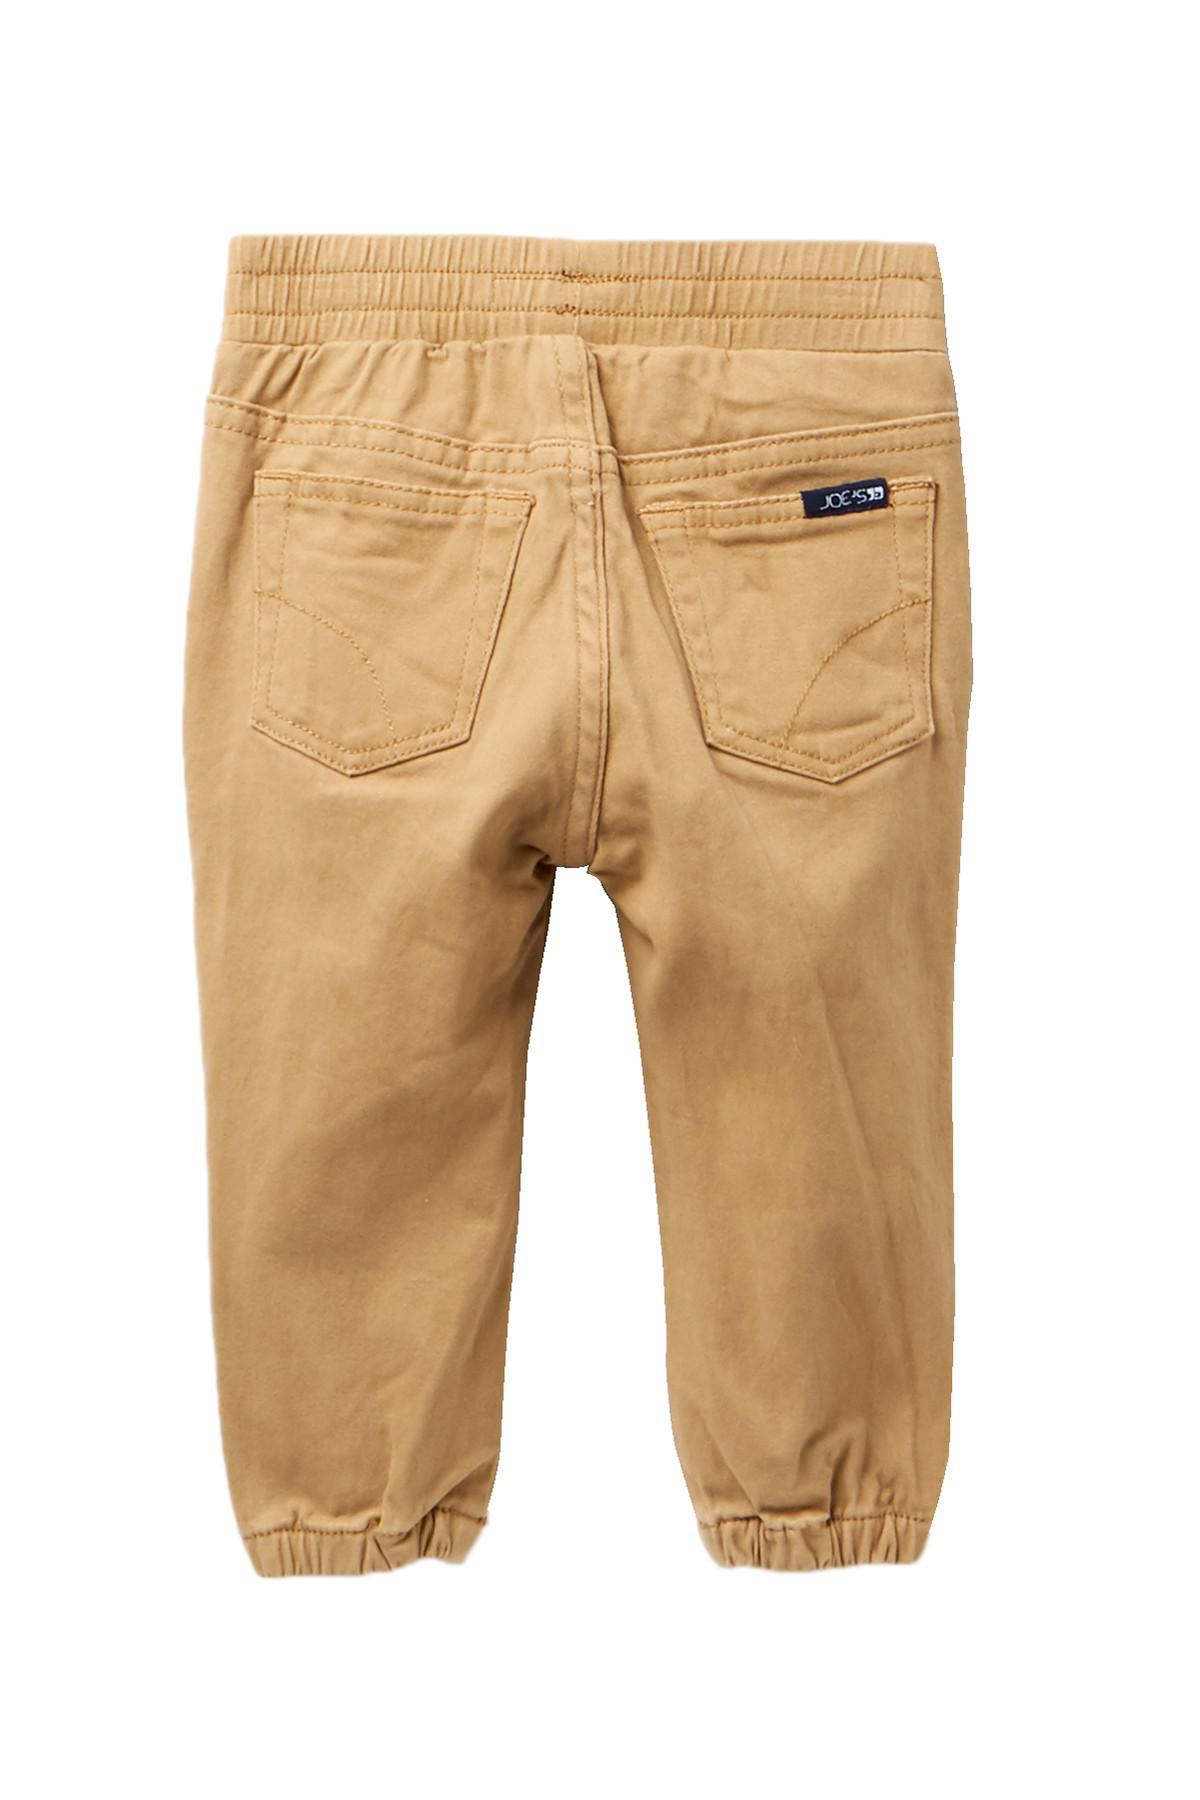 a91e4c5d8 Joe's Jeans Chambray Shirt & Twill Joggers 2-piece Set (baby Boys ...